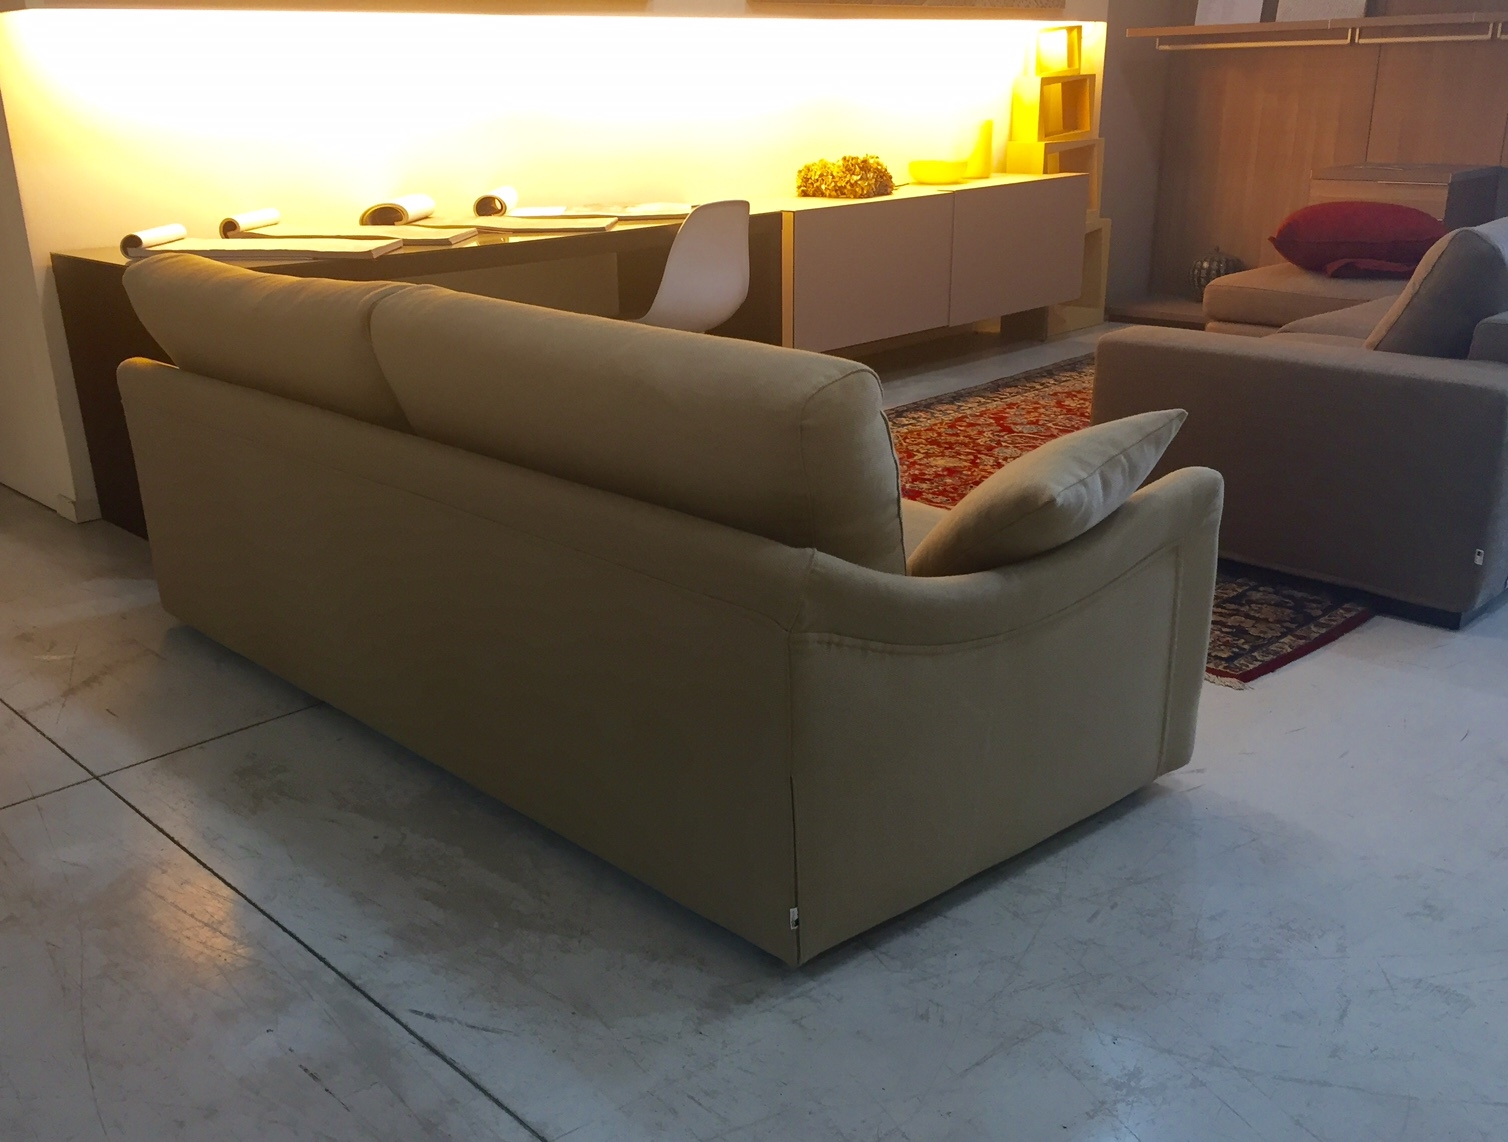 Fox italia divano bells divani lineari tessuto divano 3 - Divano 3 posti divano 2 posti ...